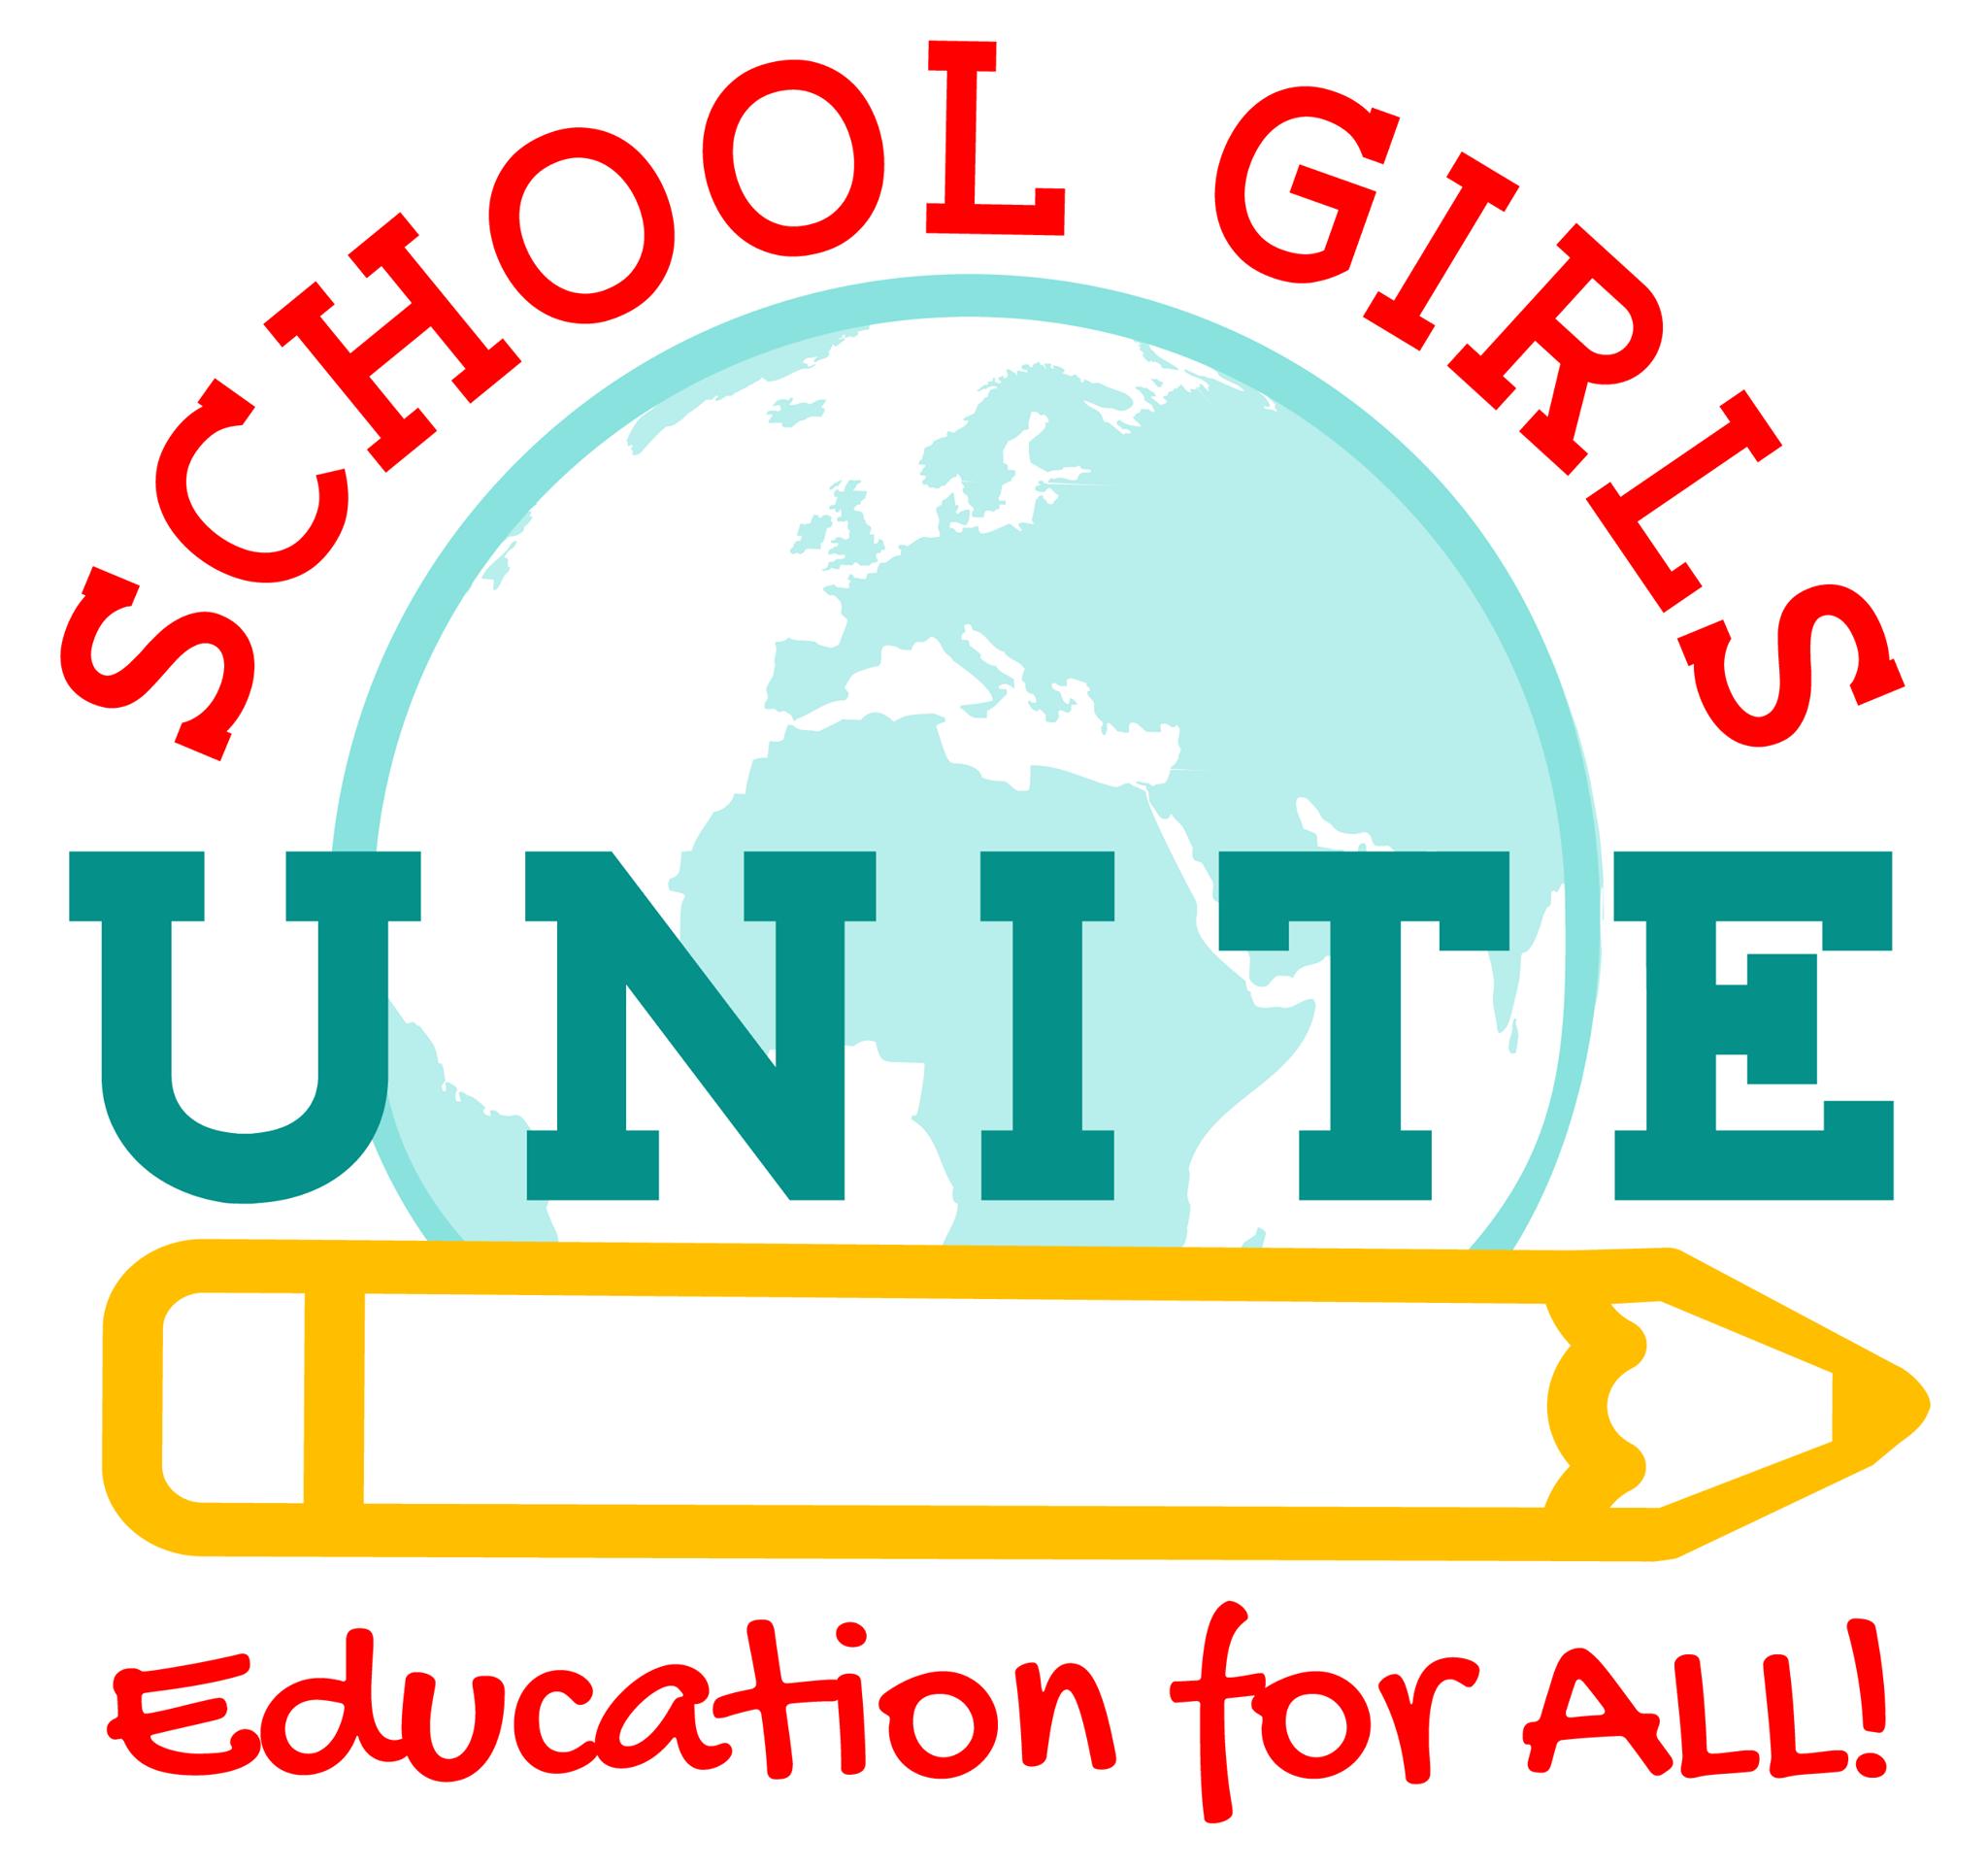 School Girls Unite